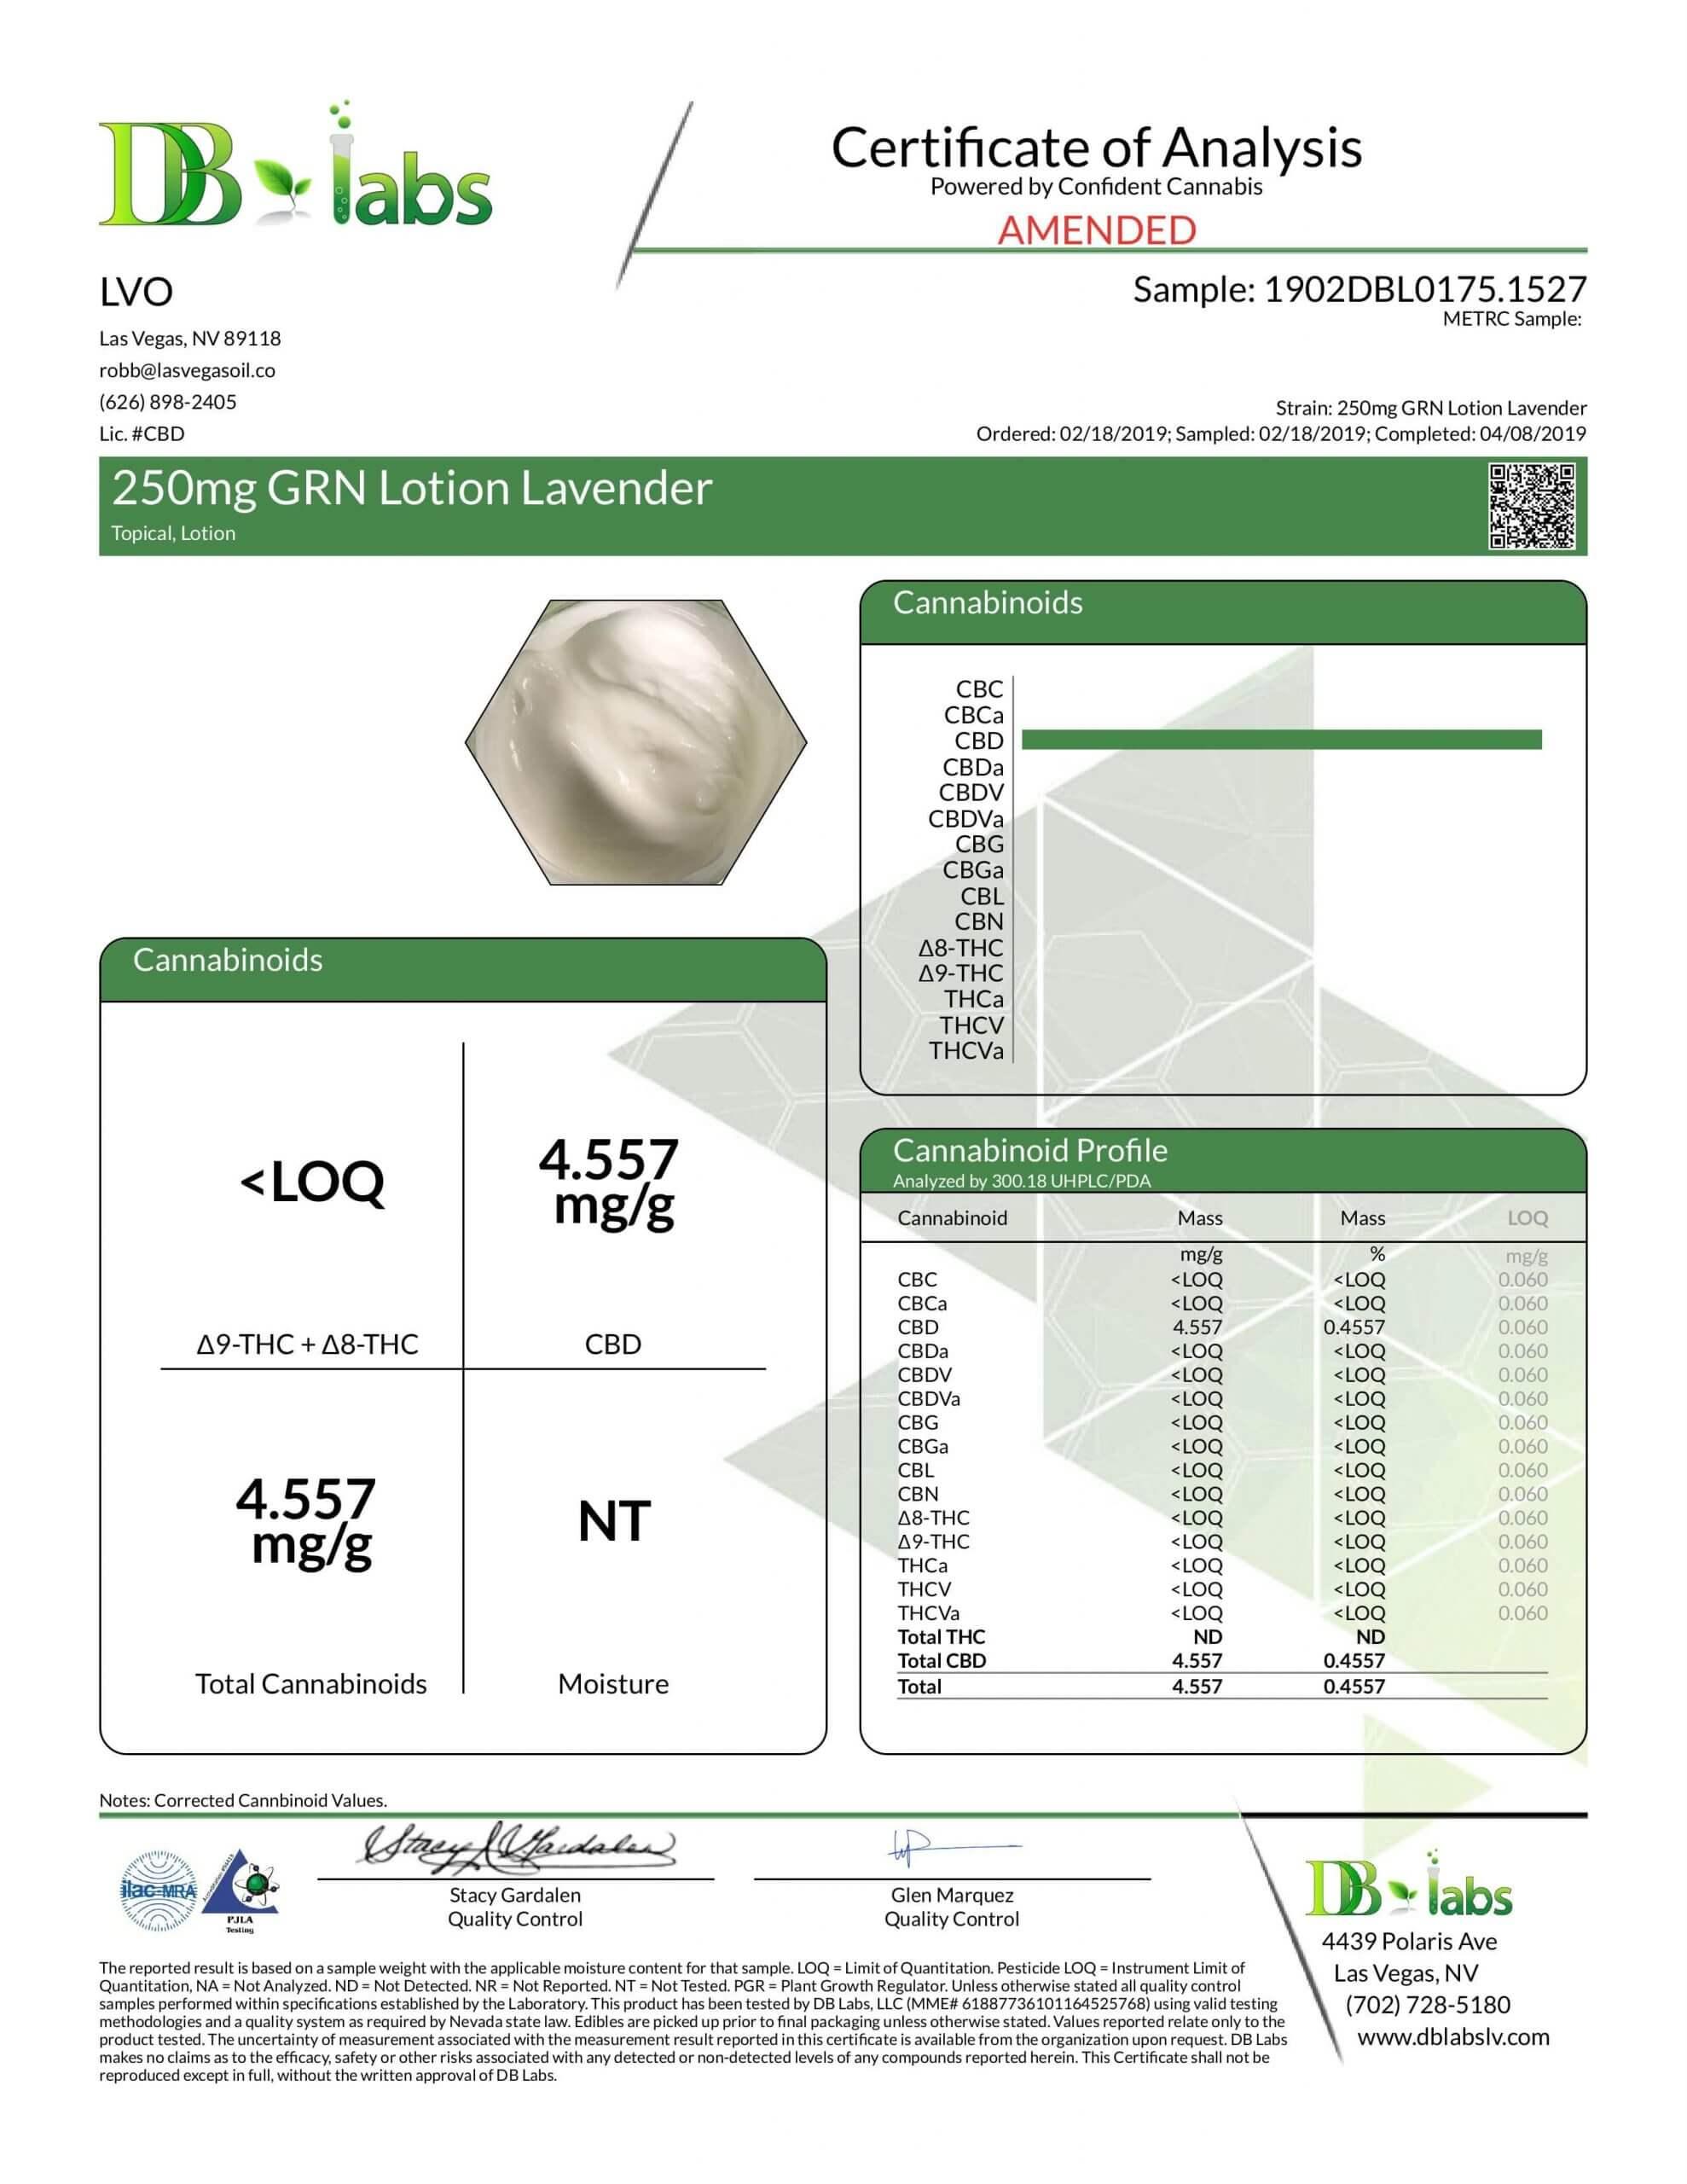 GRN CBD Infused Lotion Lavender Lab Report